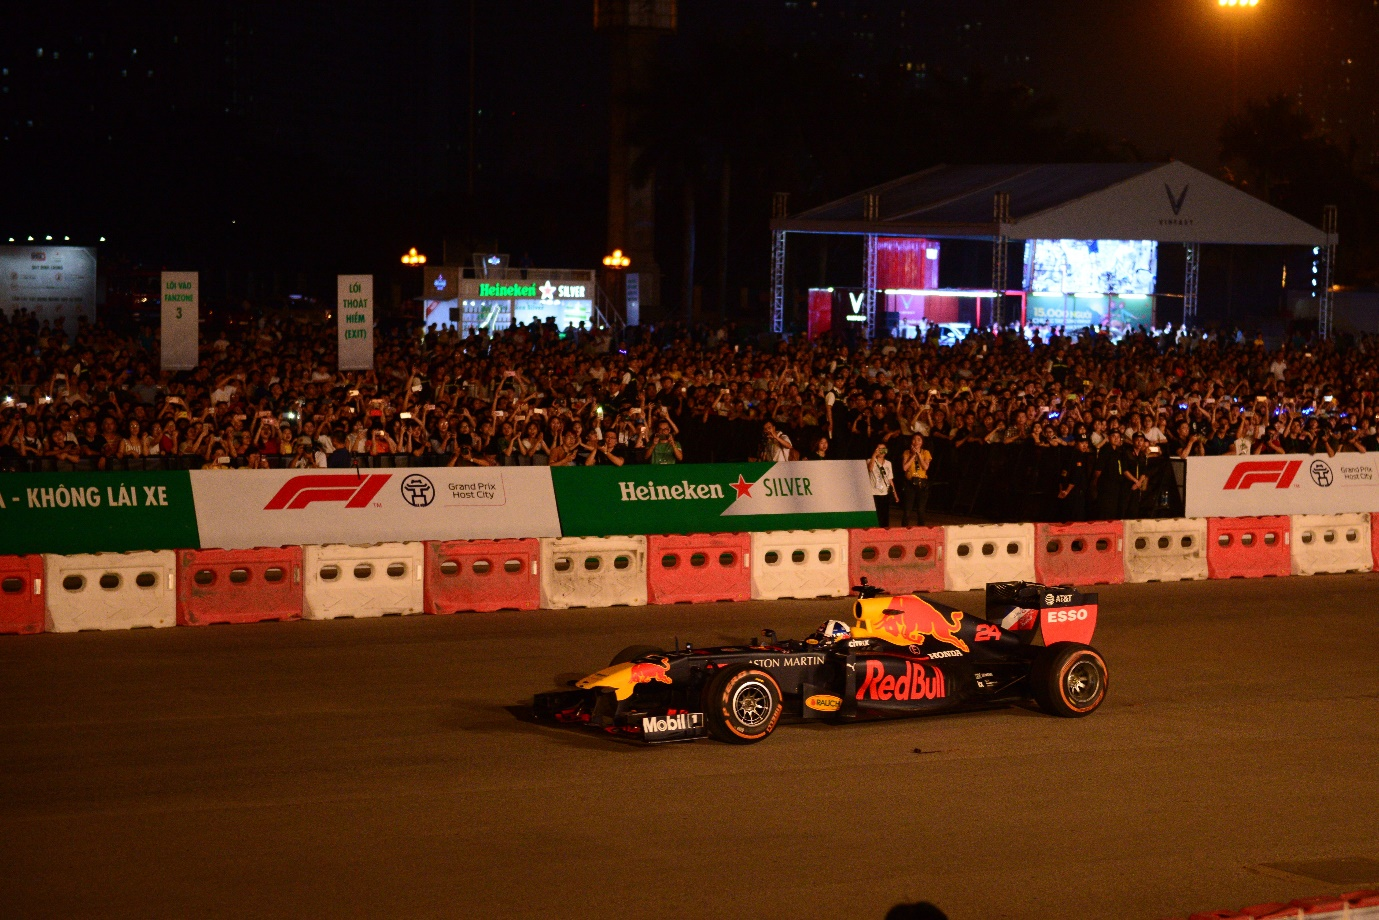 Heineken Silver brings extraordinary F1 experience to Hanoi